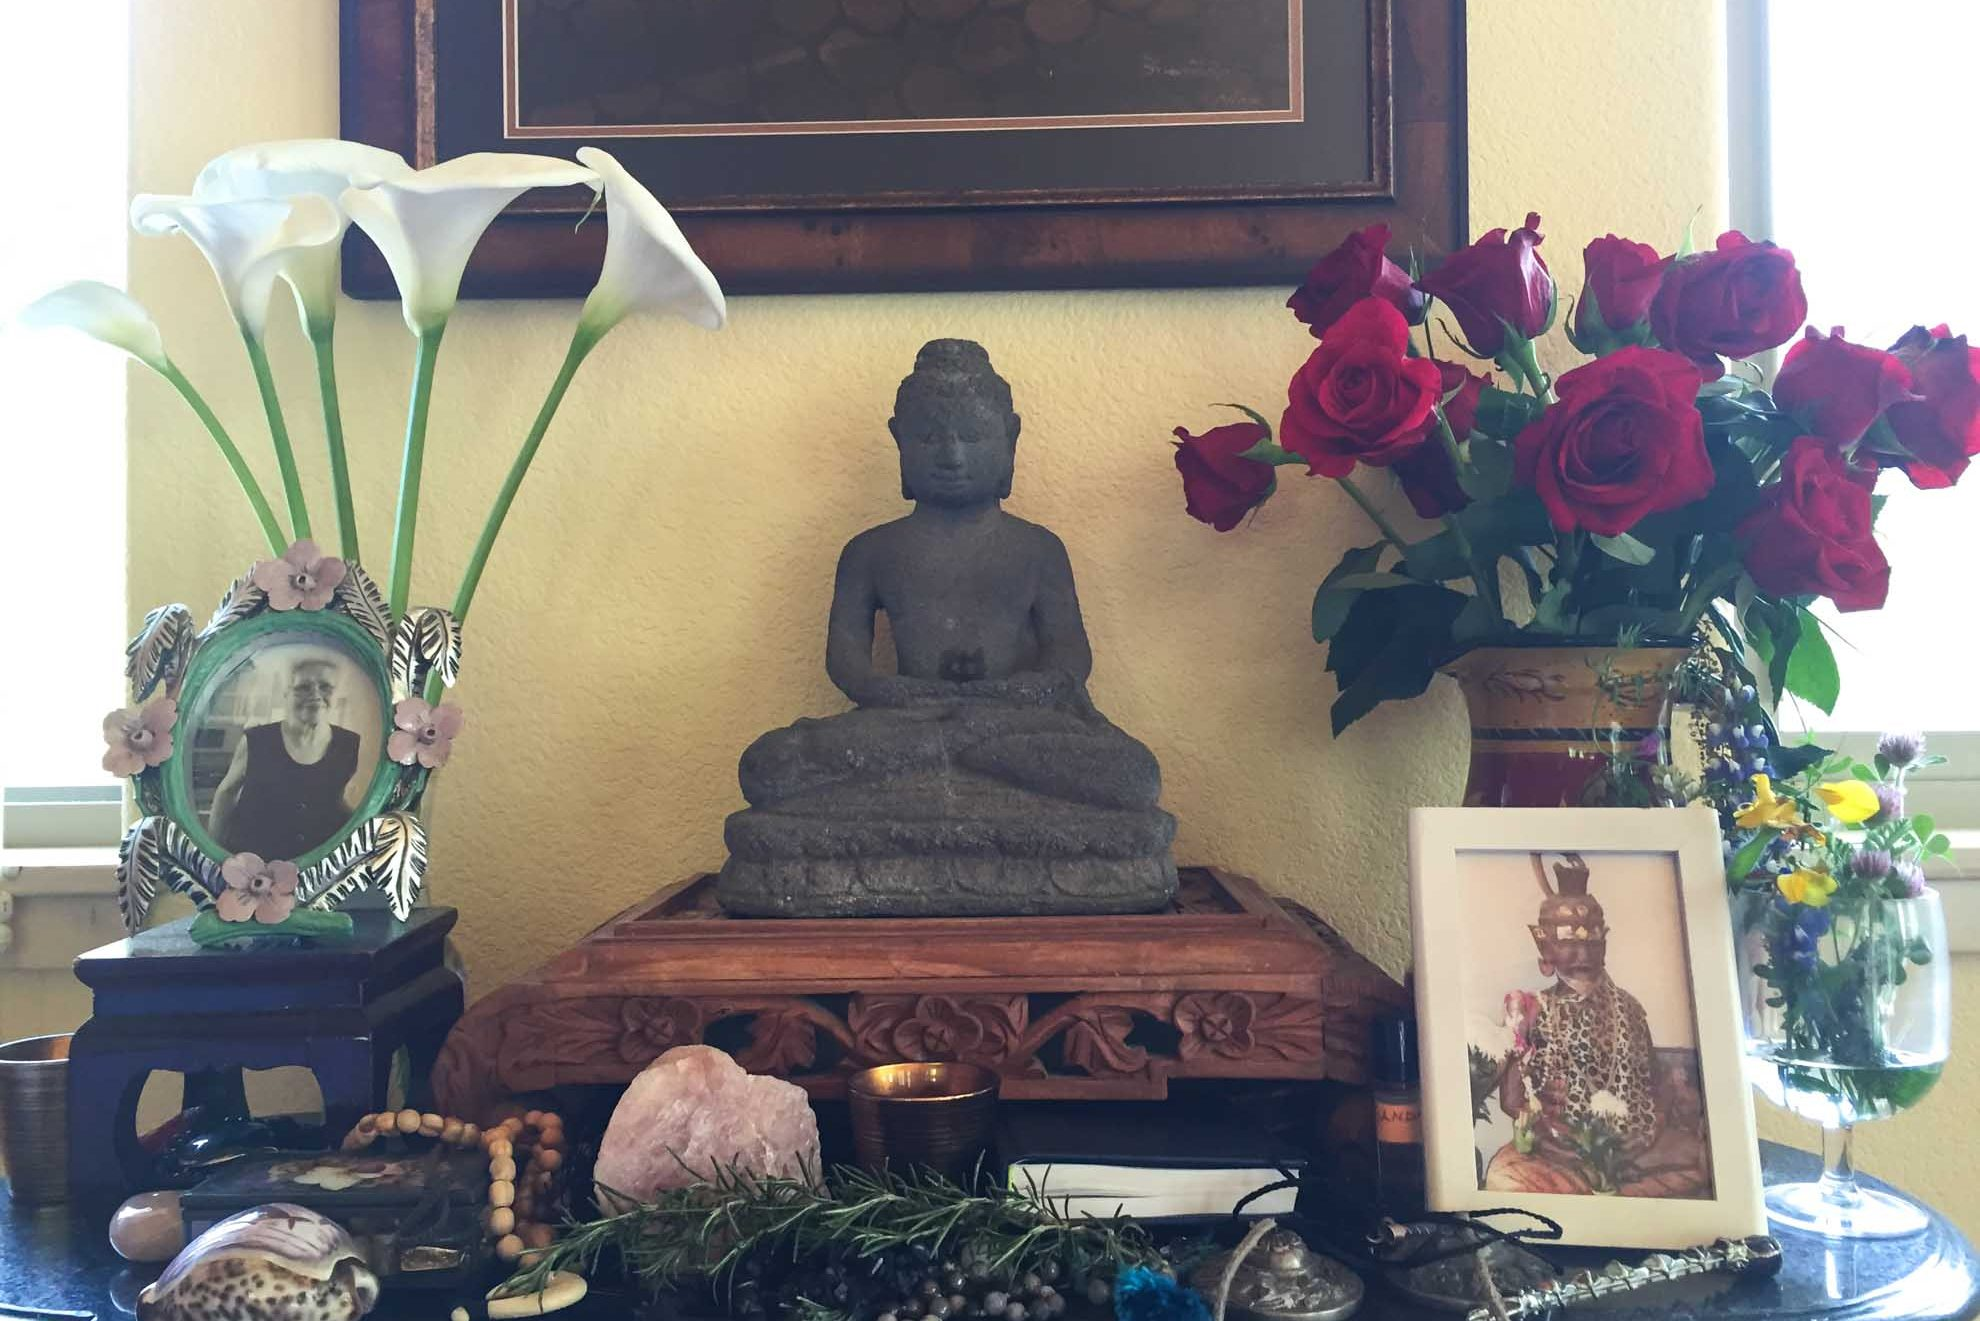 Spirit-Winds-Thai-Massage-Photo May 11, 10 55 42 AM